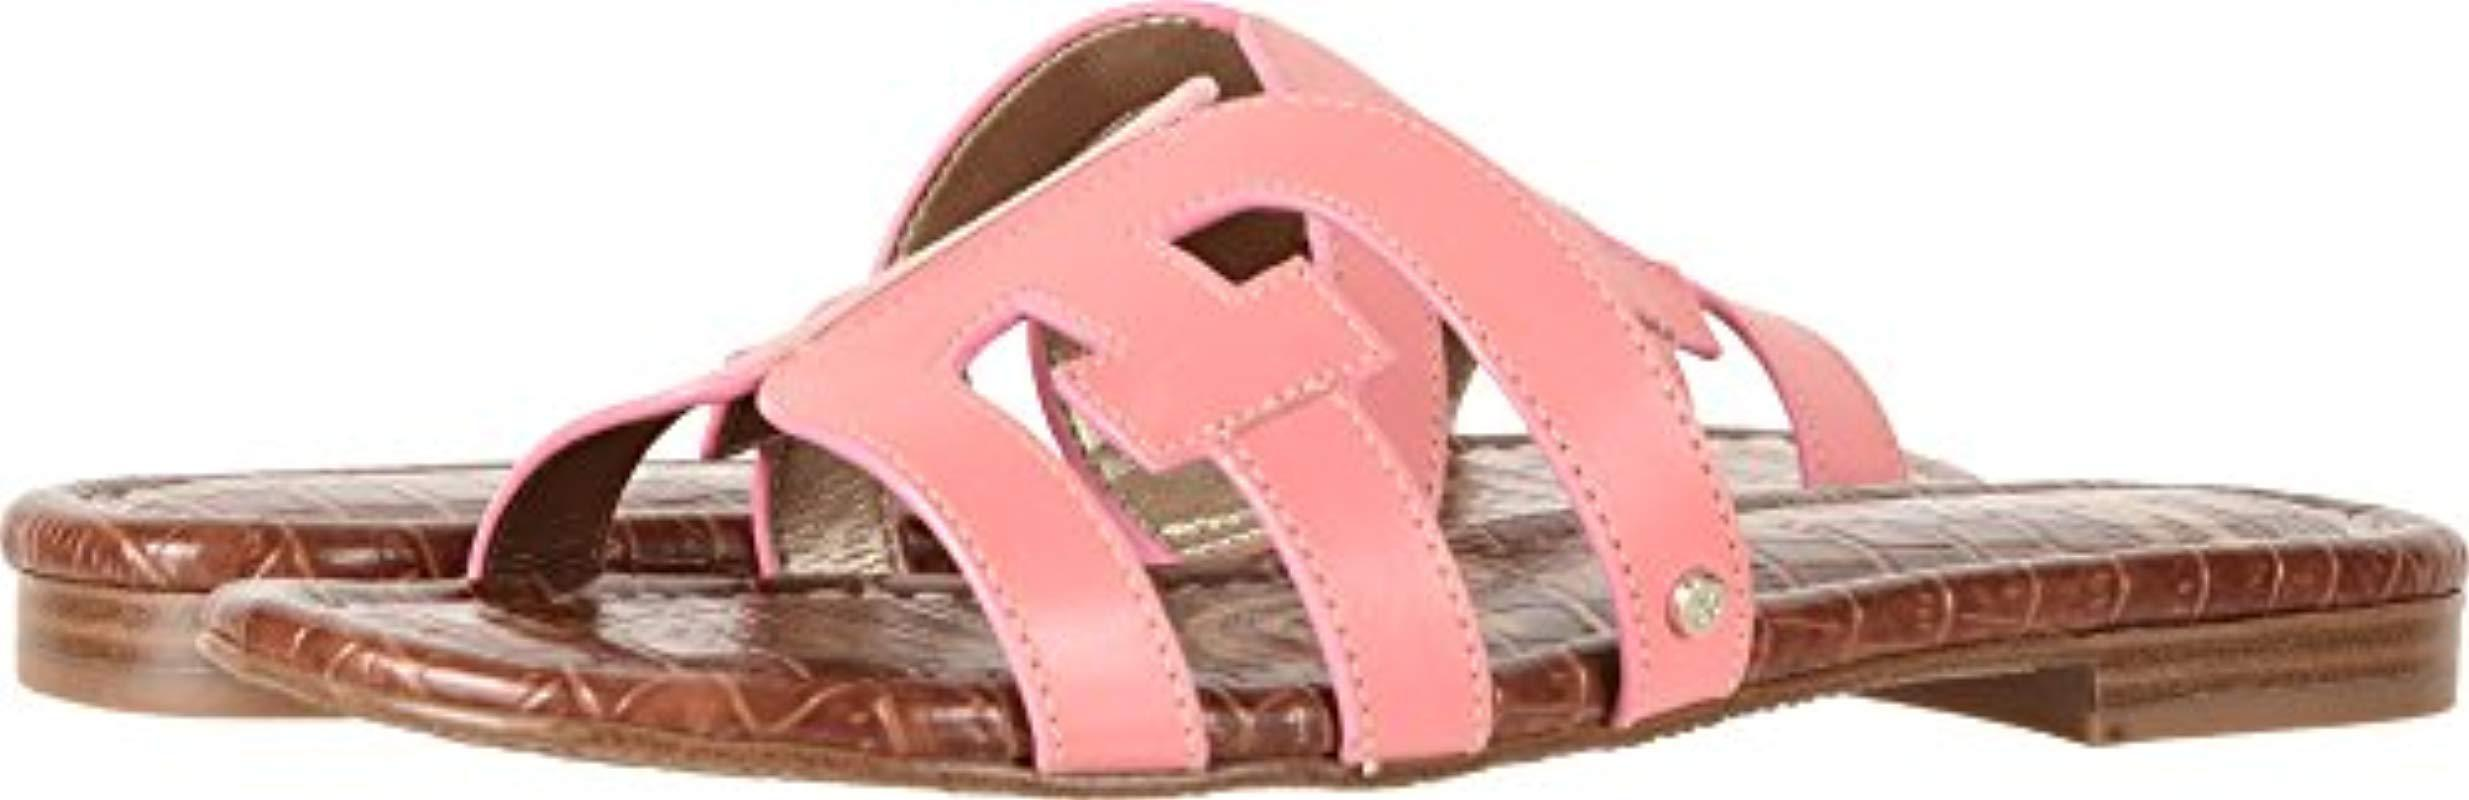 b9fcf87616c3c Lyst - Sam Edelman Bay Slide Sandal in Pink - Save 5.263157894736835%